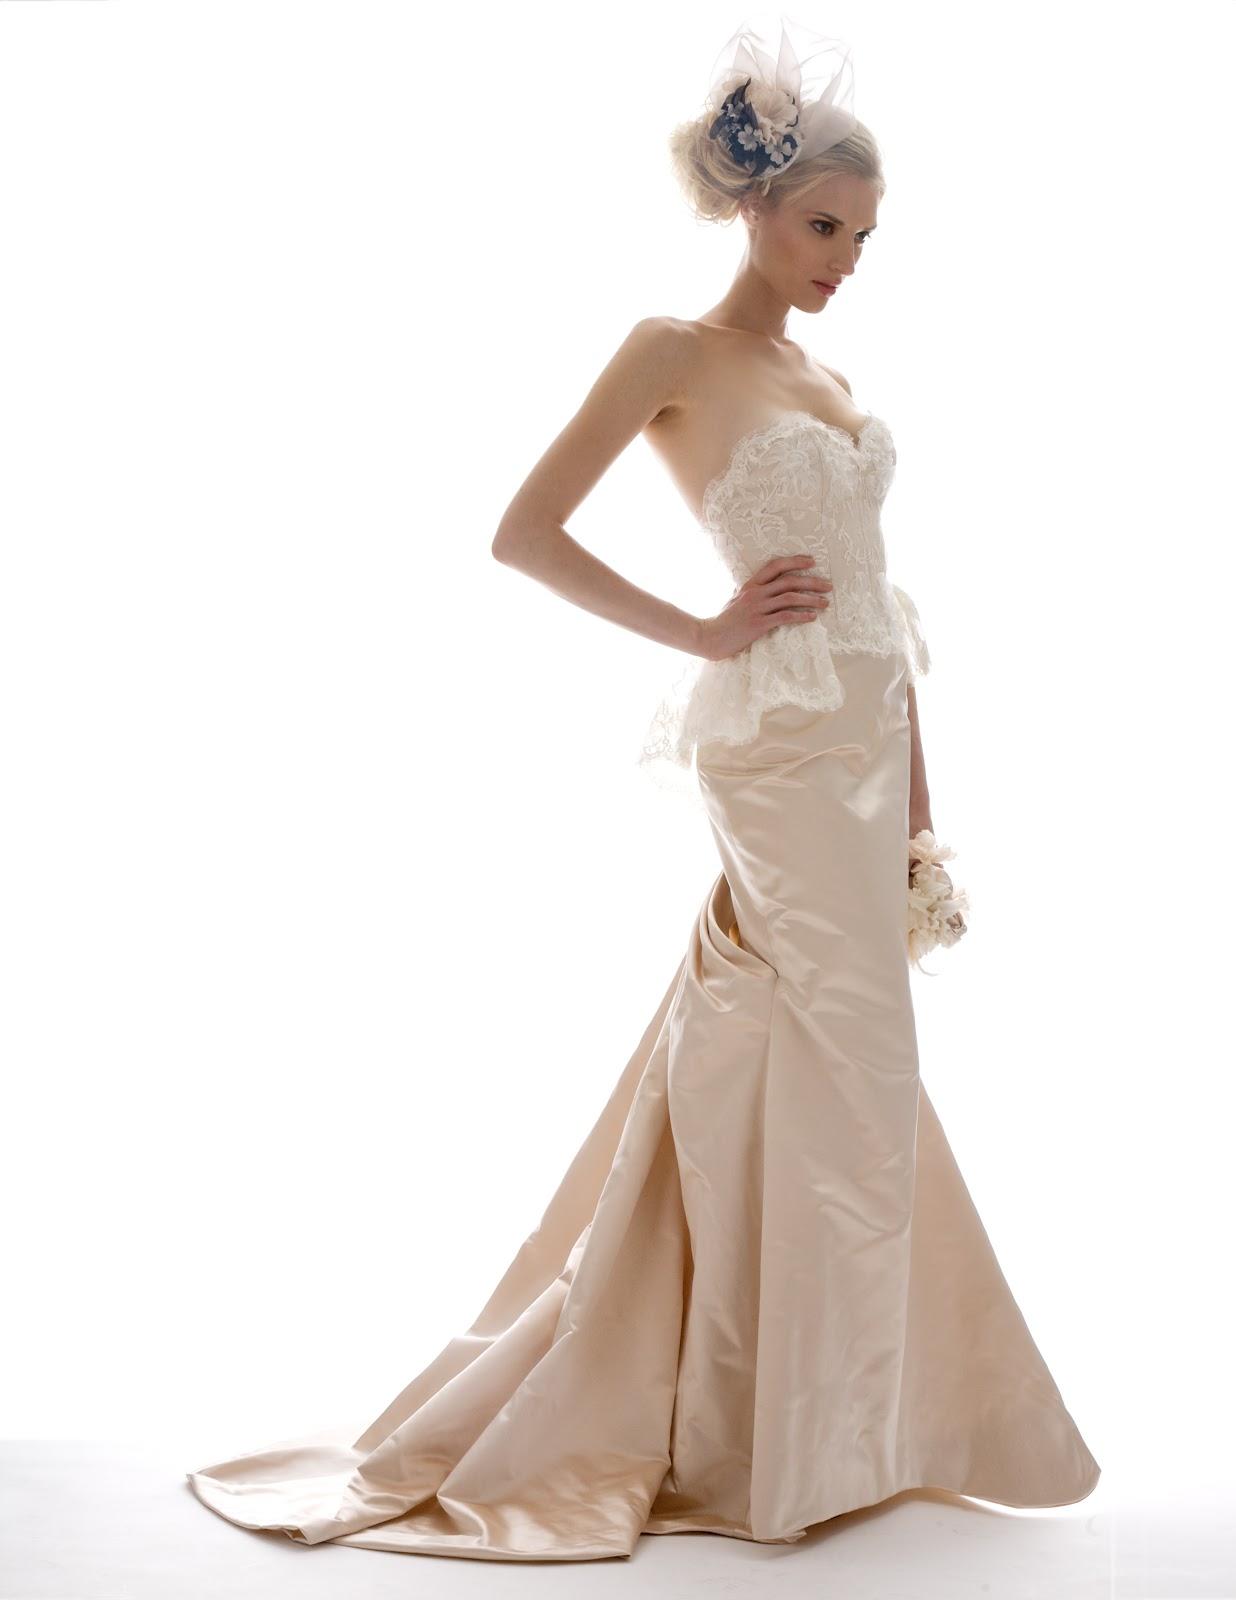 Teekidesignsbyamyoram Stunning Bridal Gown Designer